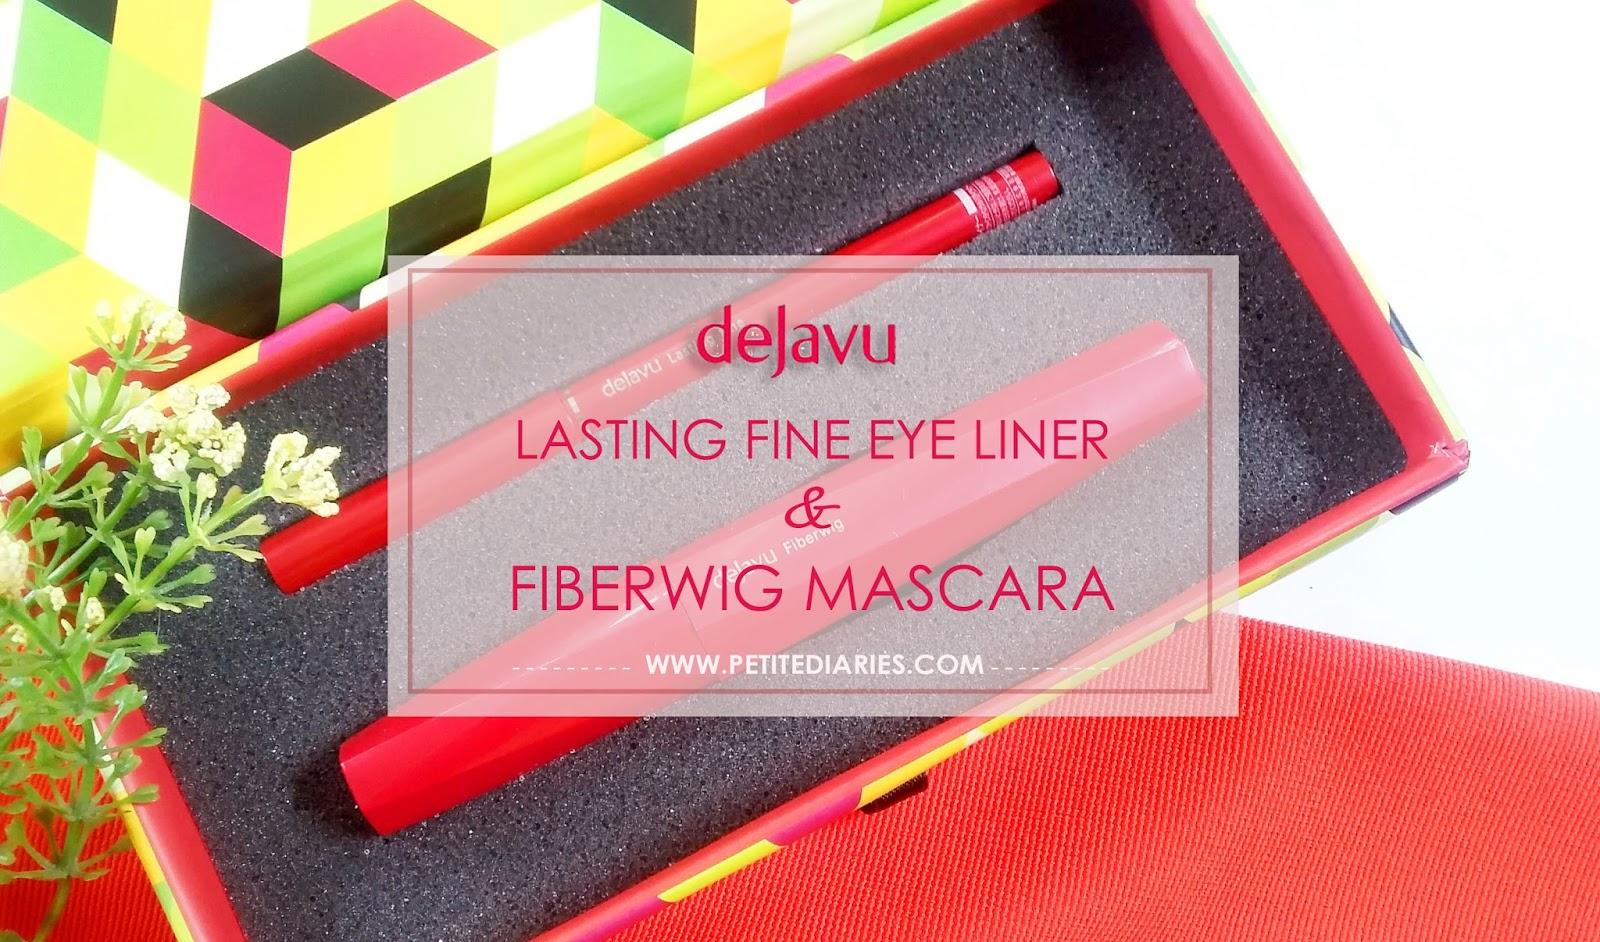 dejavu lasting fine eyeliner fiberwig mascara japan review